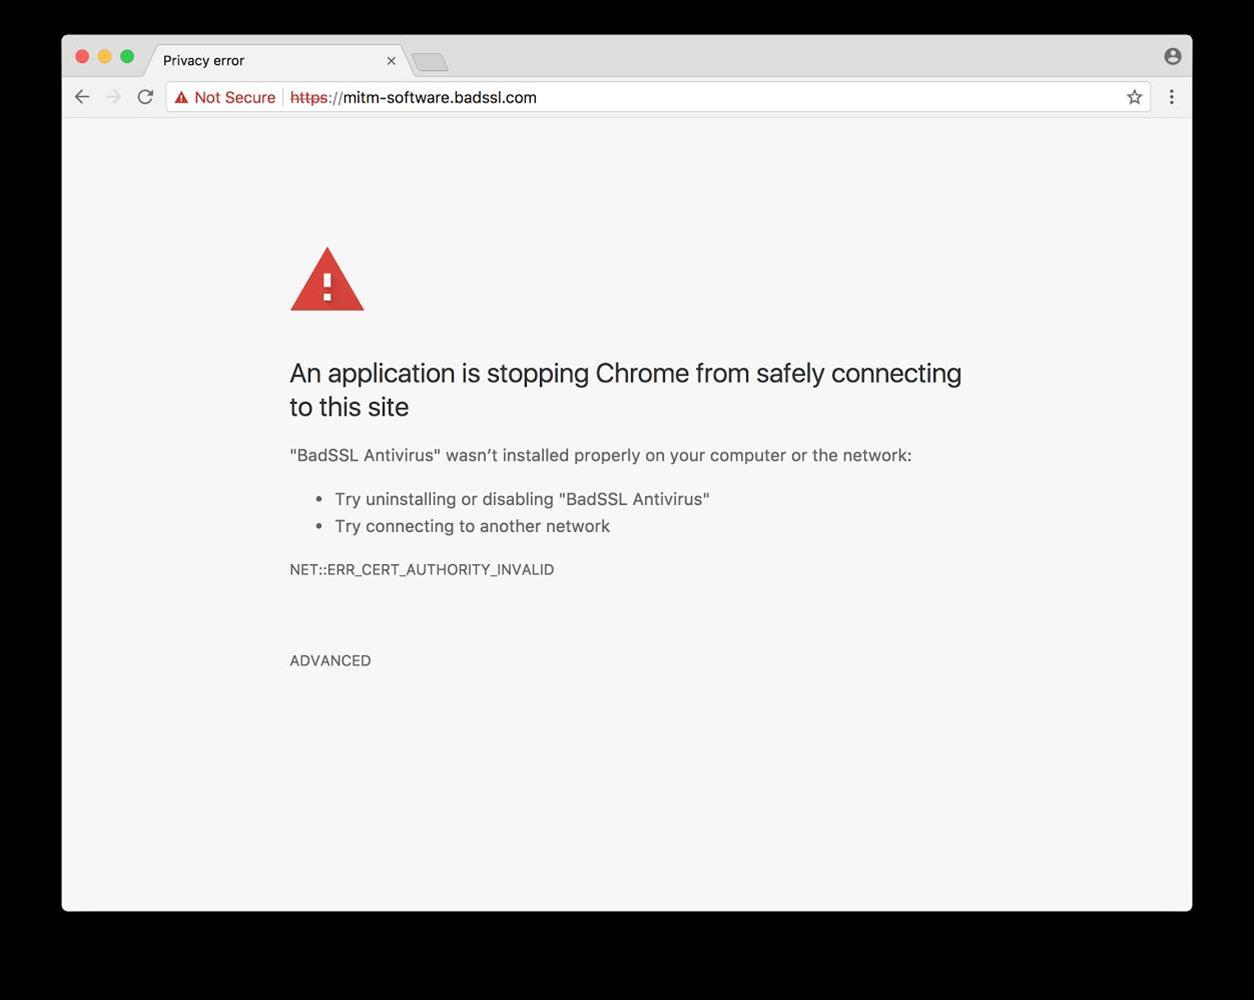 Chrome to provide TLS interception warnings